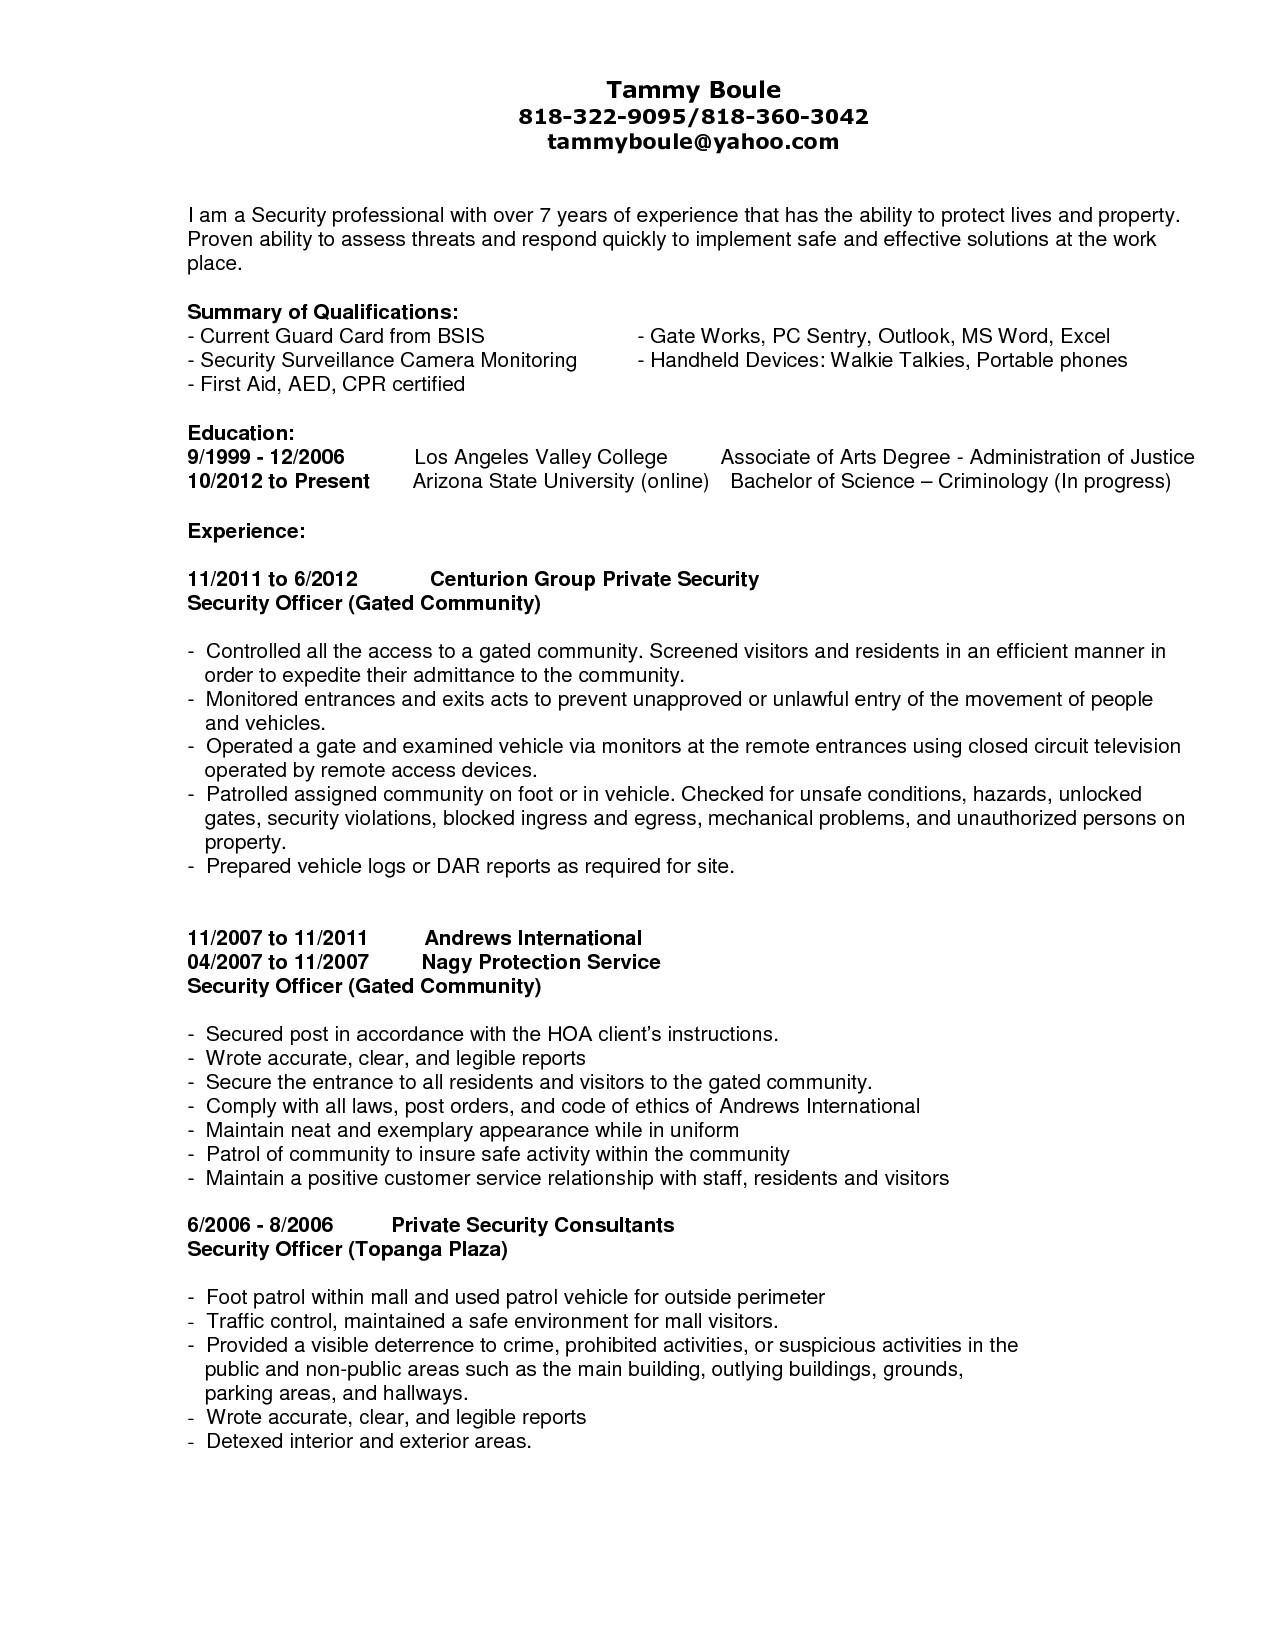 Professional Reference Letter Template - Elegant Professional Reference Letter Template